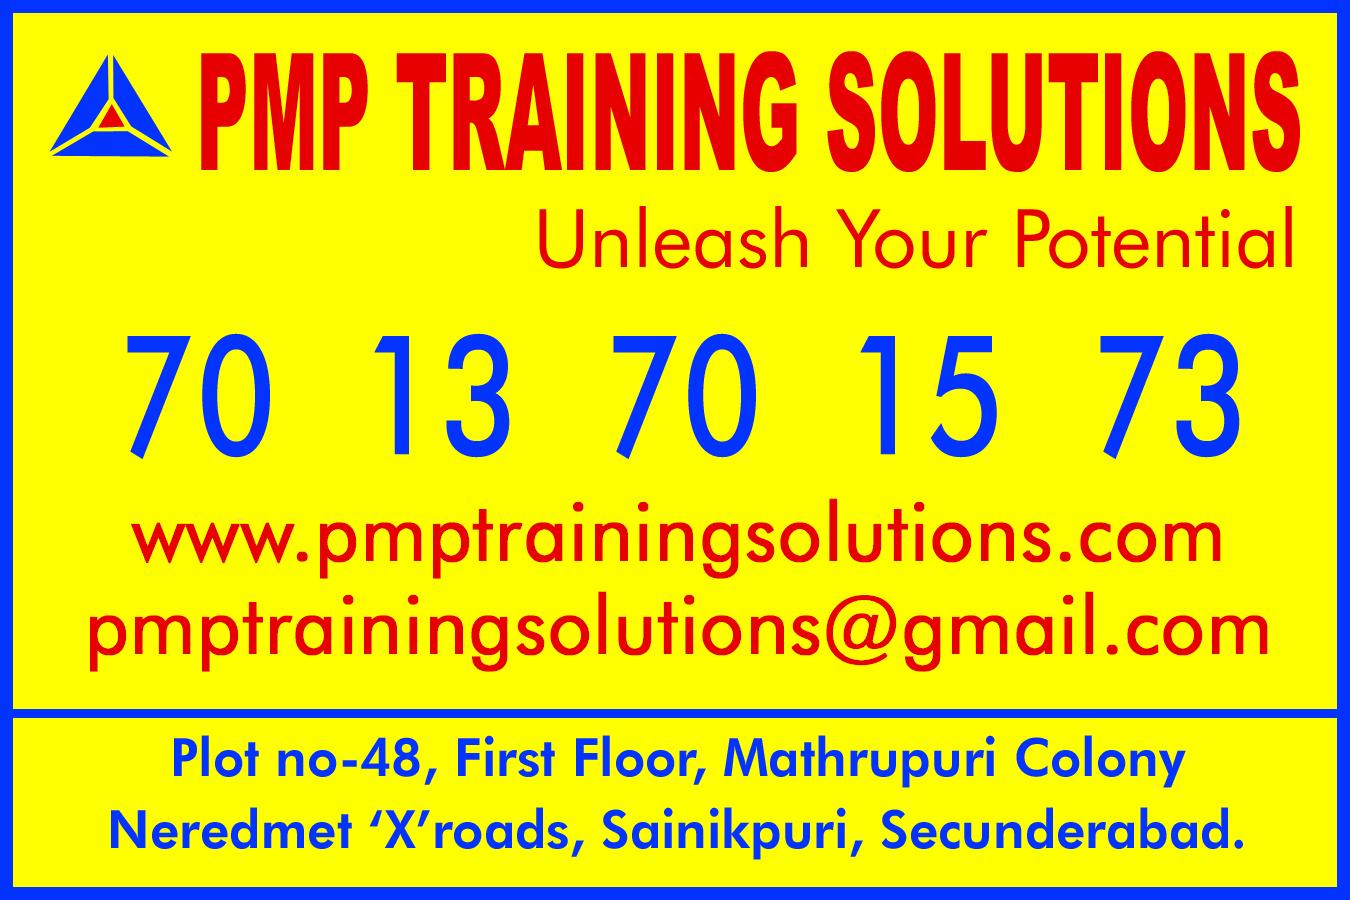 pmp training solutions....18 x 12..jpg